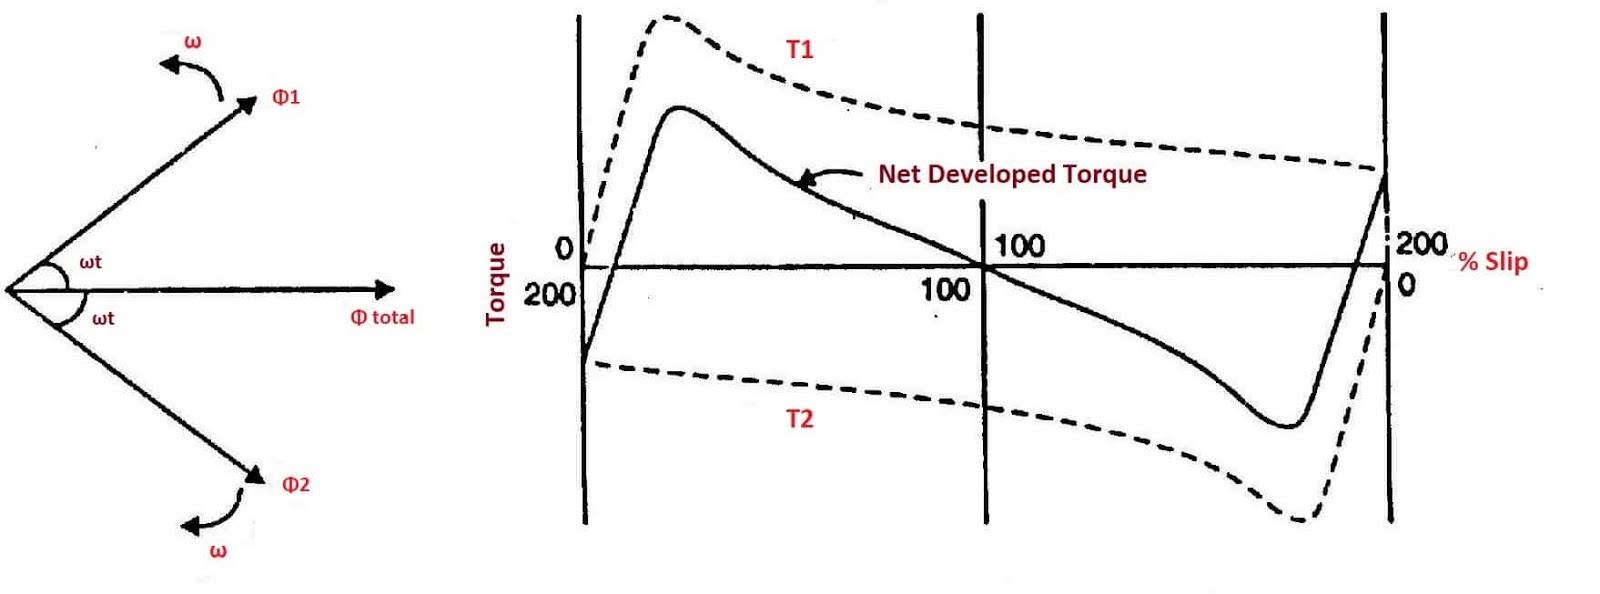 Torque-slip-characteristics-induction-motor